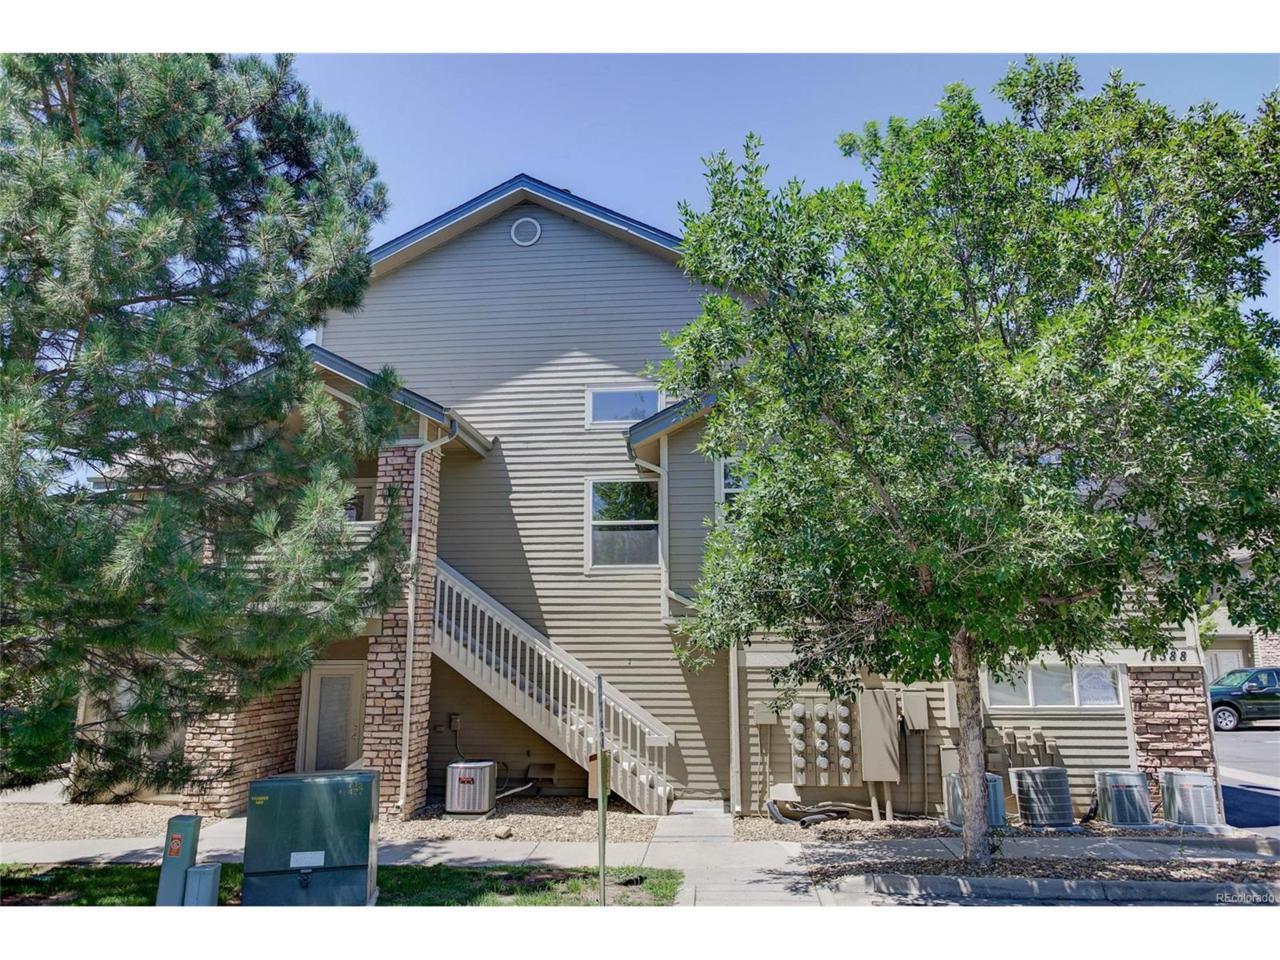 18388 E Eldorado Place J, Aurora, CO 80013 (MLS #6755962) :: 8z Real Estate